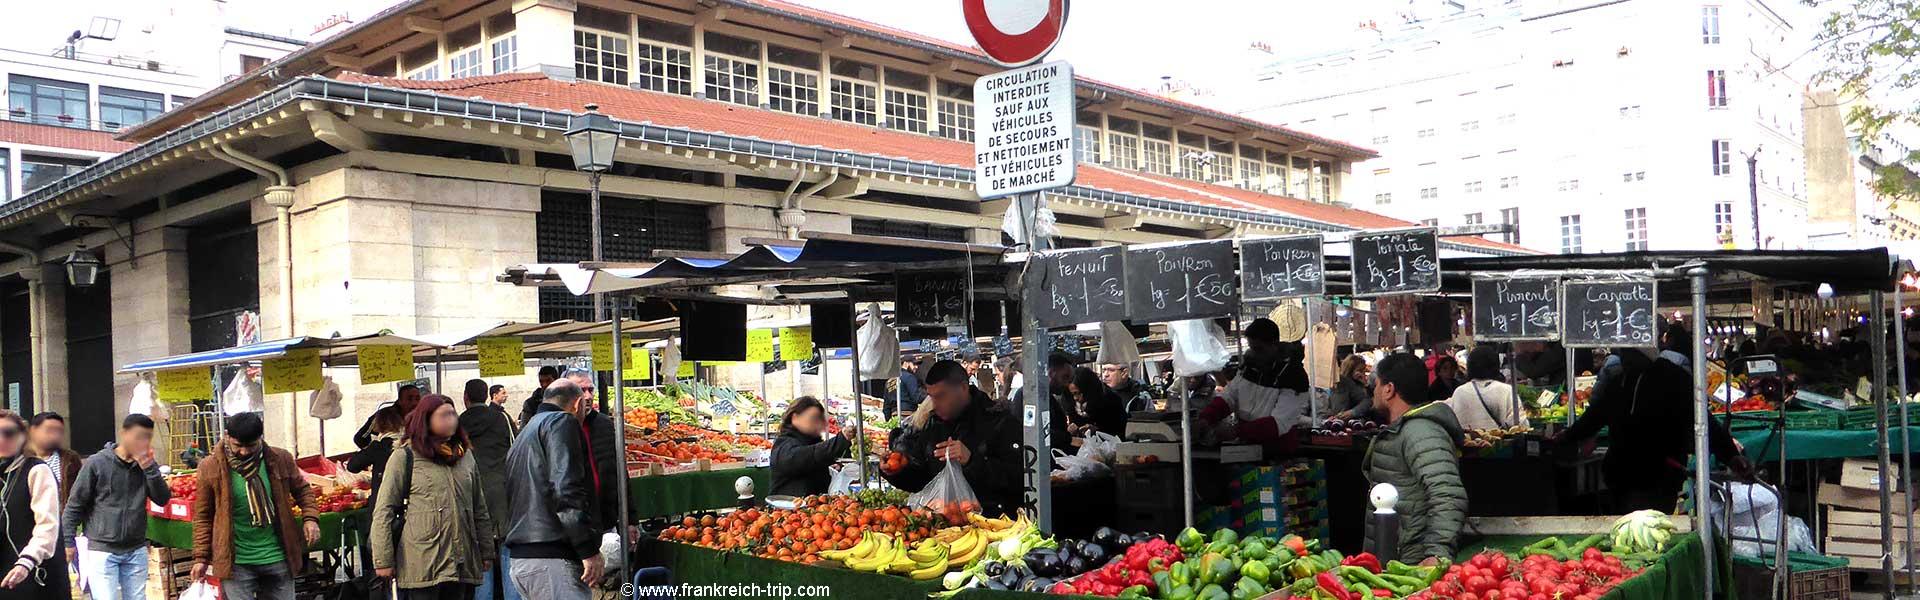 Lebensmittelmarkt Paris Marché d'Aligre